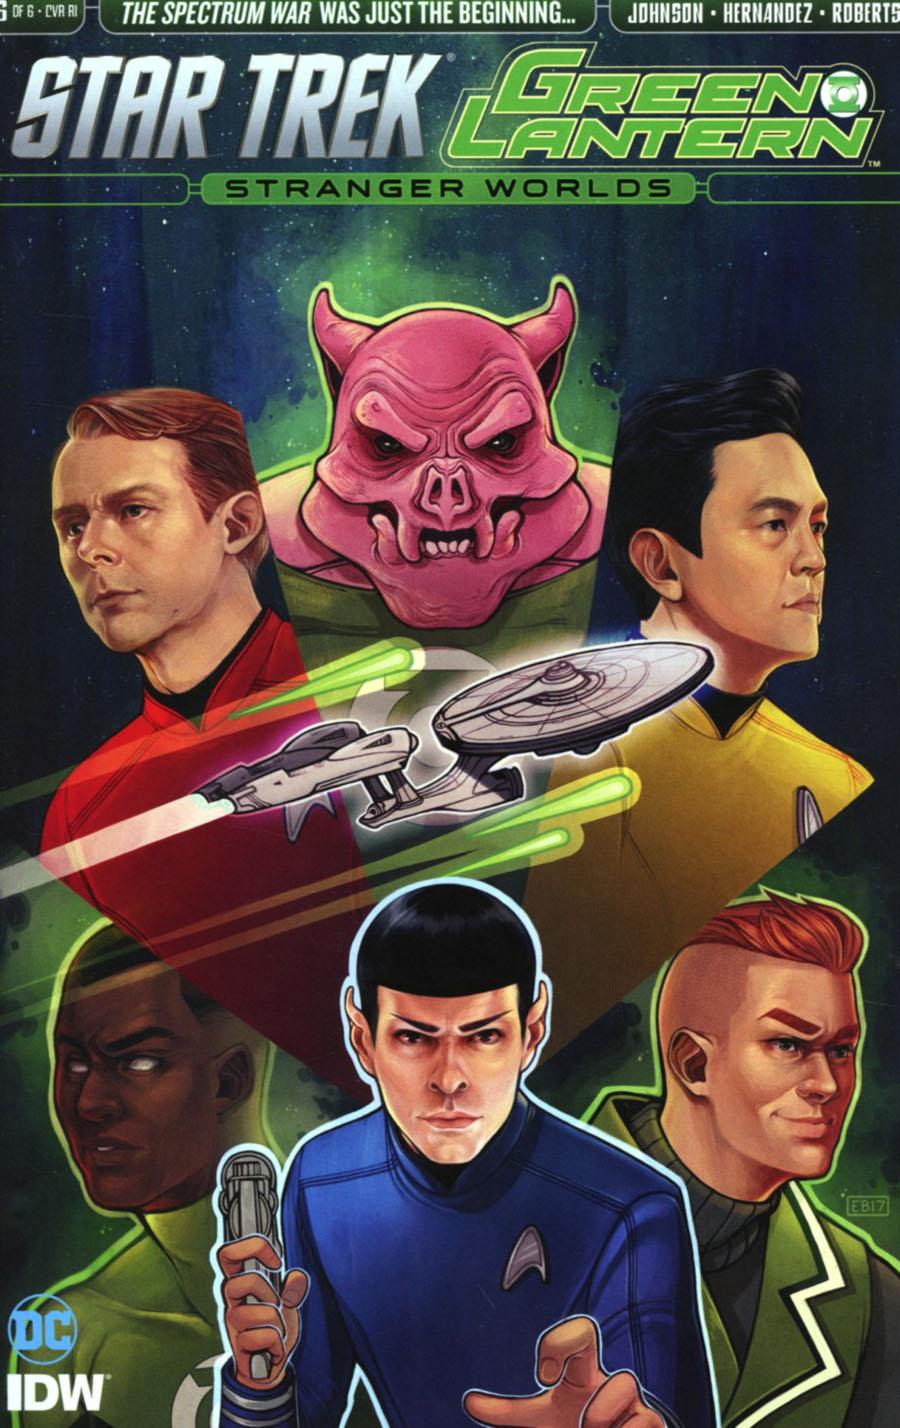 Star Trek Green Lantern Vol 2 Stranger Worlds #6 Cover C Incentive Elizabeth Beals Variant Cover